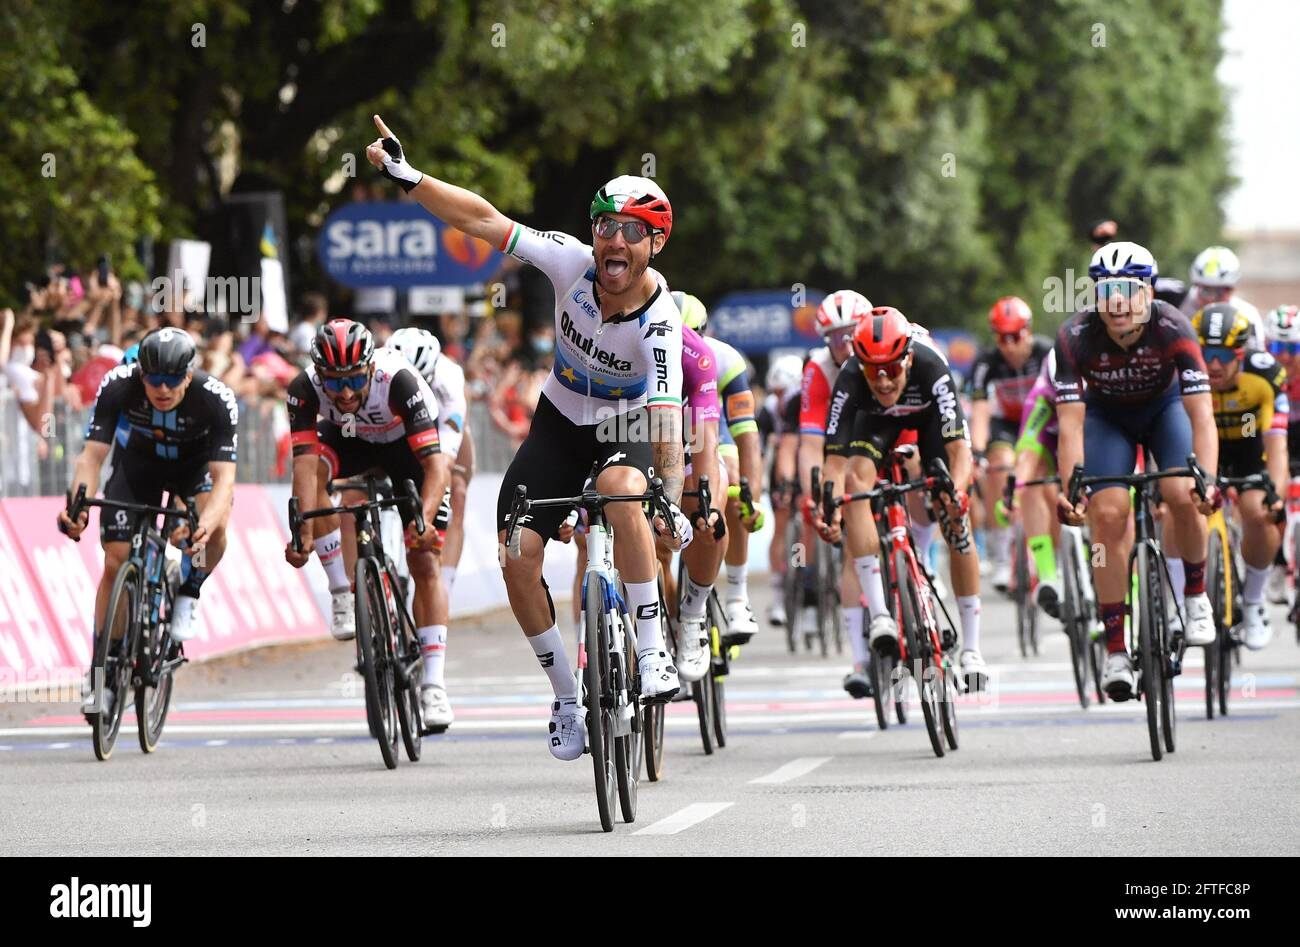 Ciclismo - giro d'Italia - Stage 13 - Ravenna to Verona, Italy - May 21, 2021 il pilota Qhubeka Assos Giacomo Nizzolo d'Italia celebra la tappa vincente 13 REUTERS/Jennifer Lorenzini Foto Stock